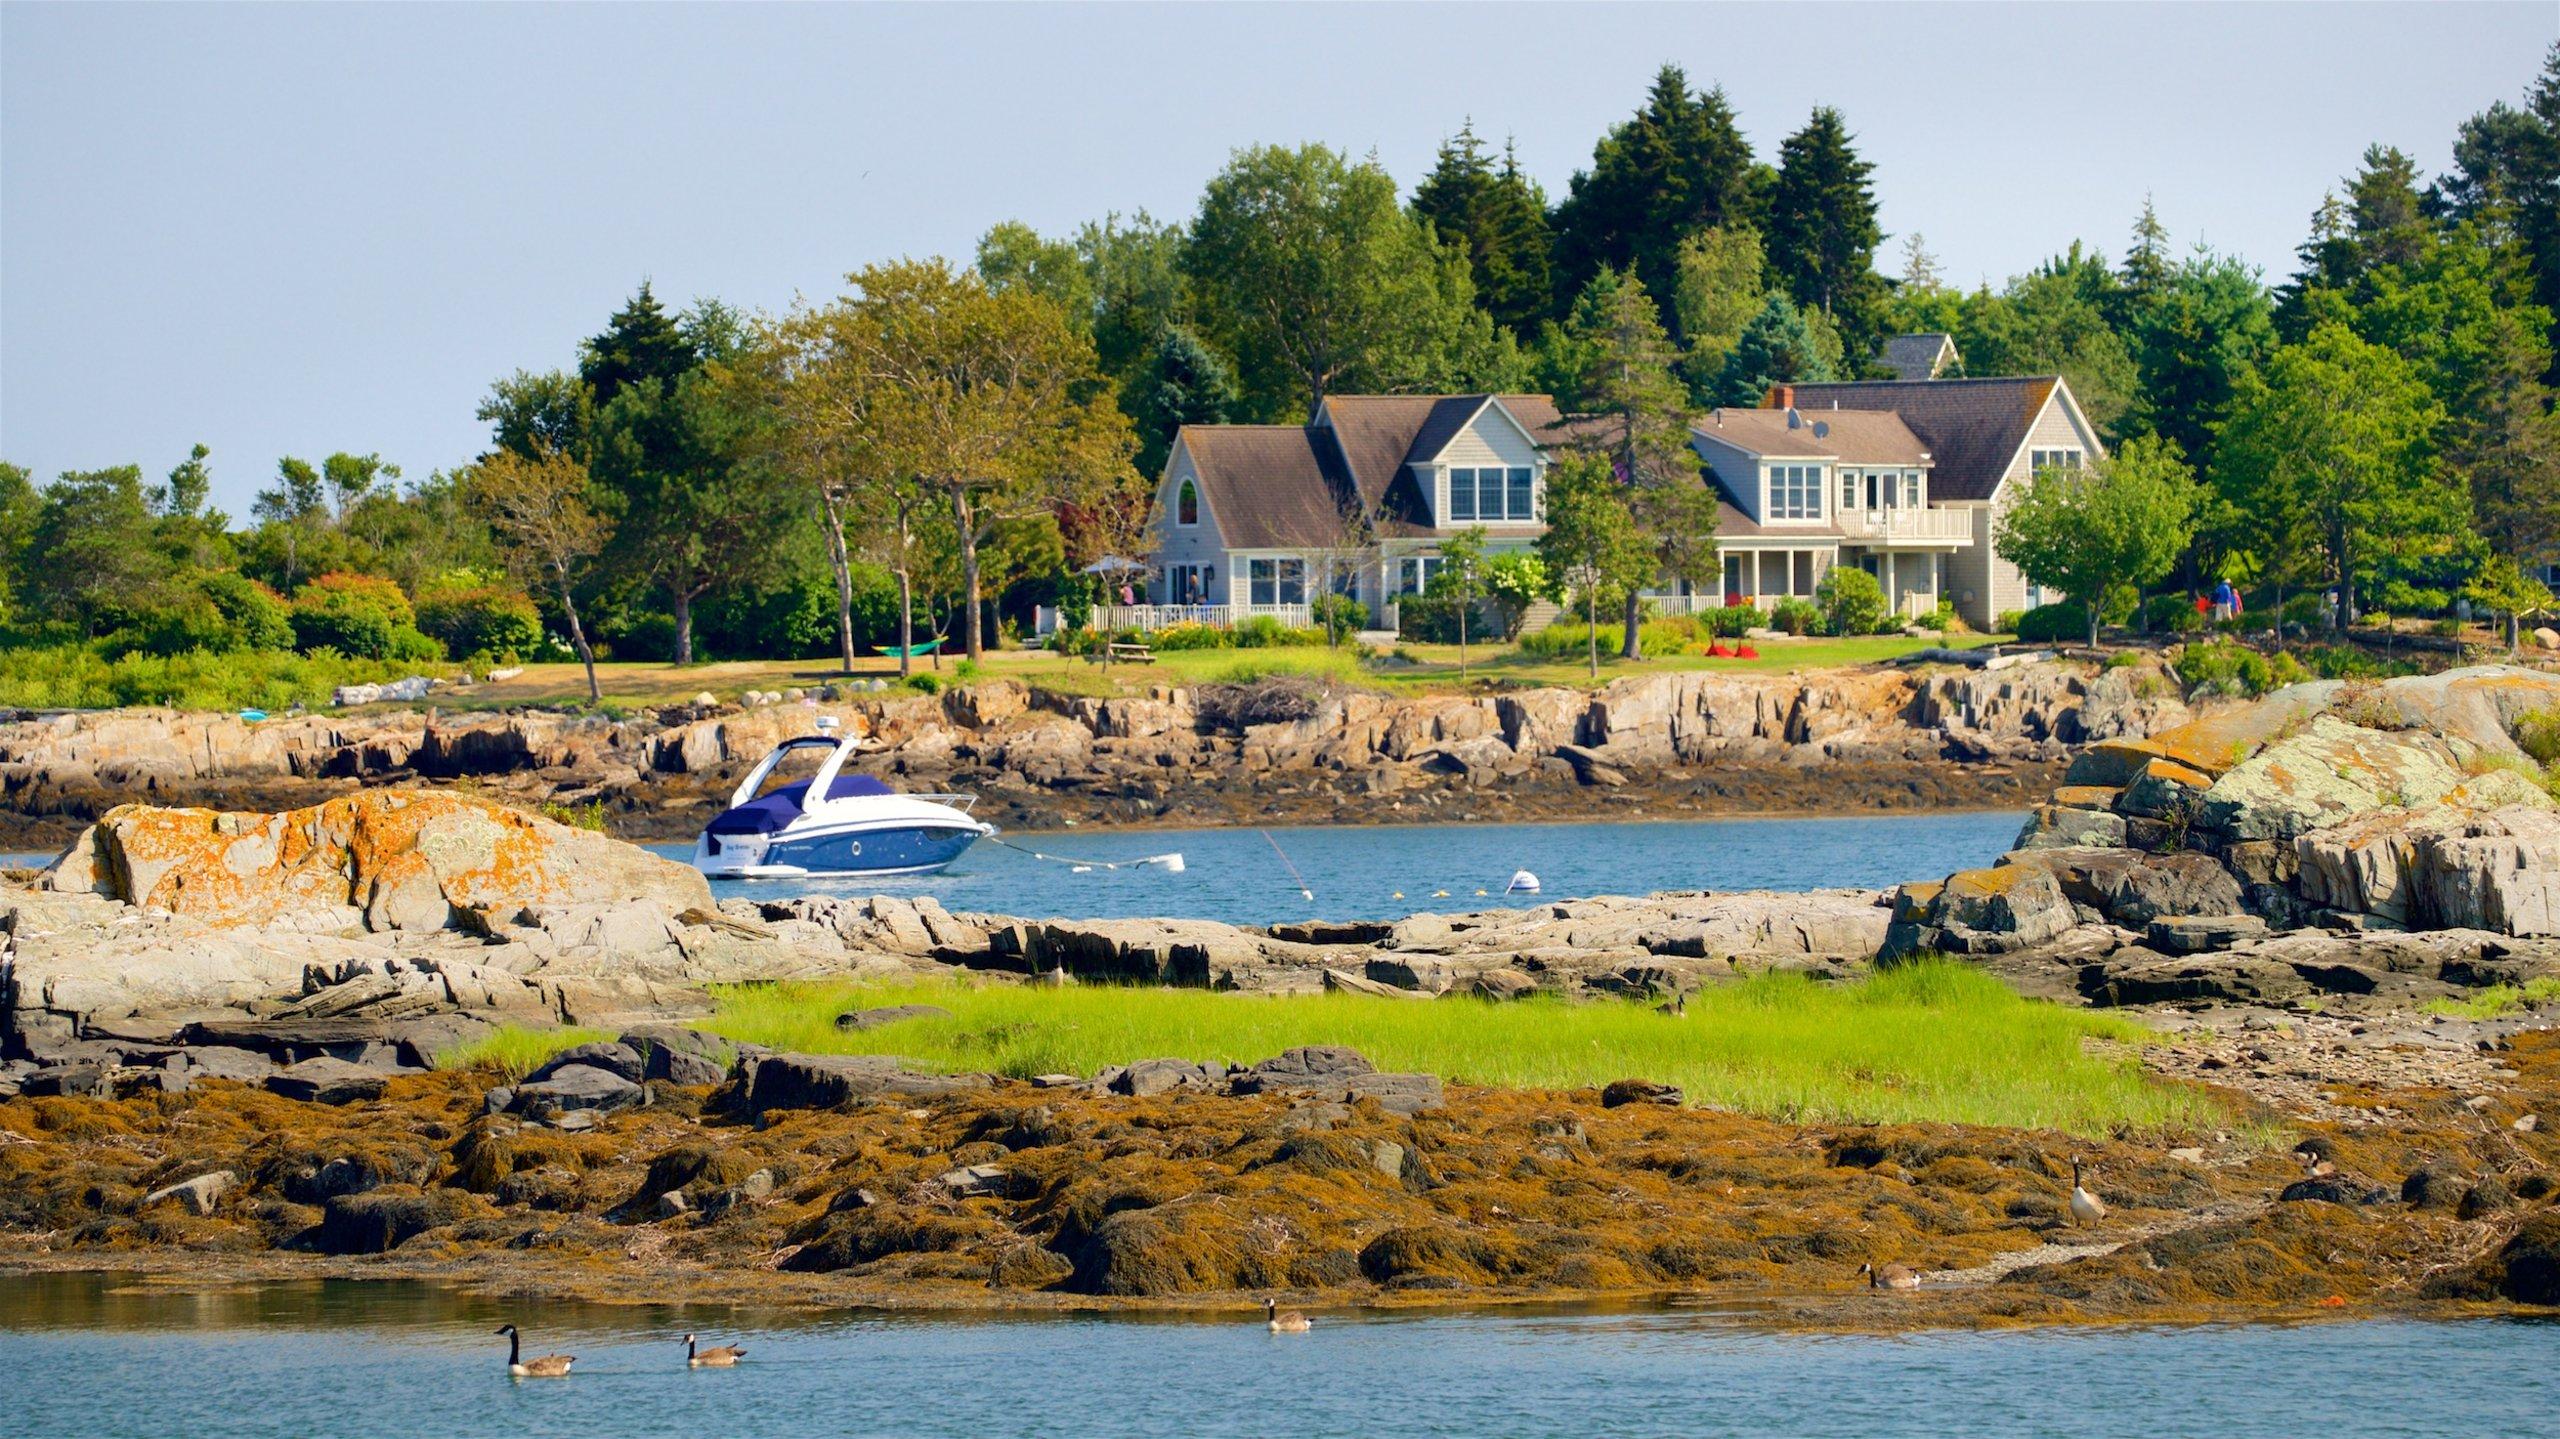 Bailey Island, Maine, United States of America